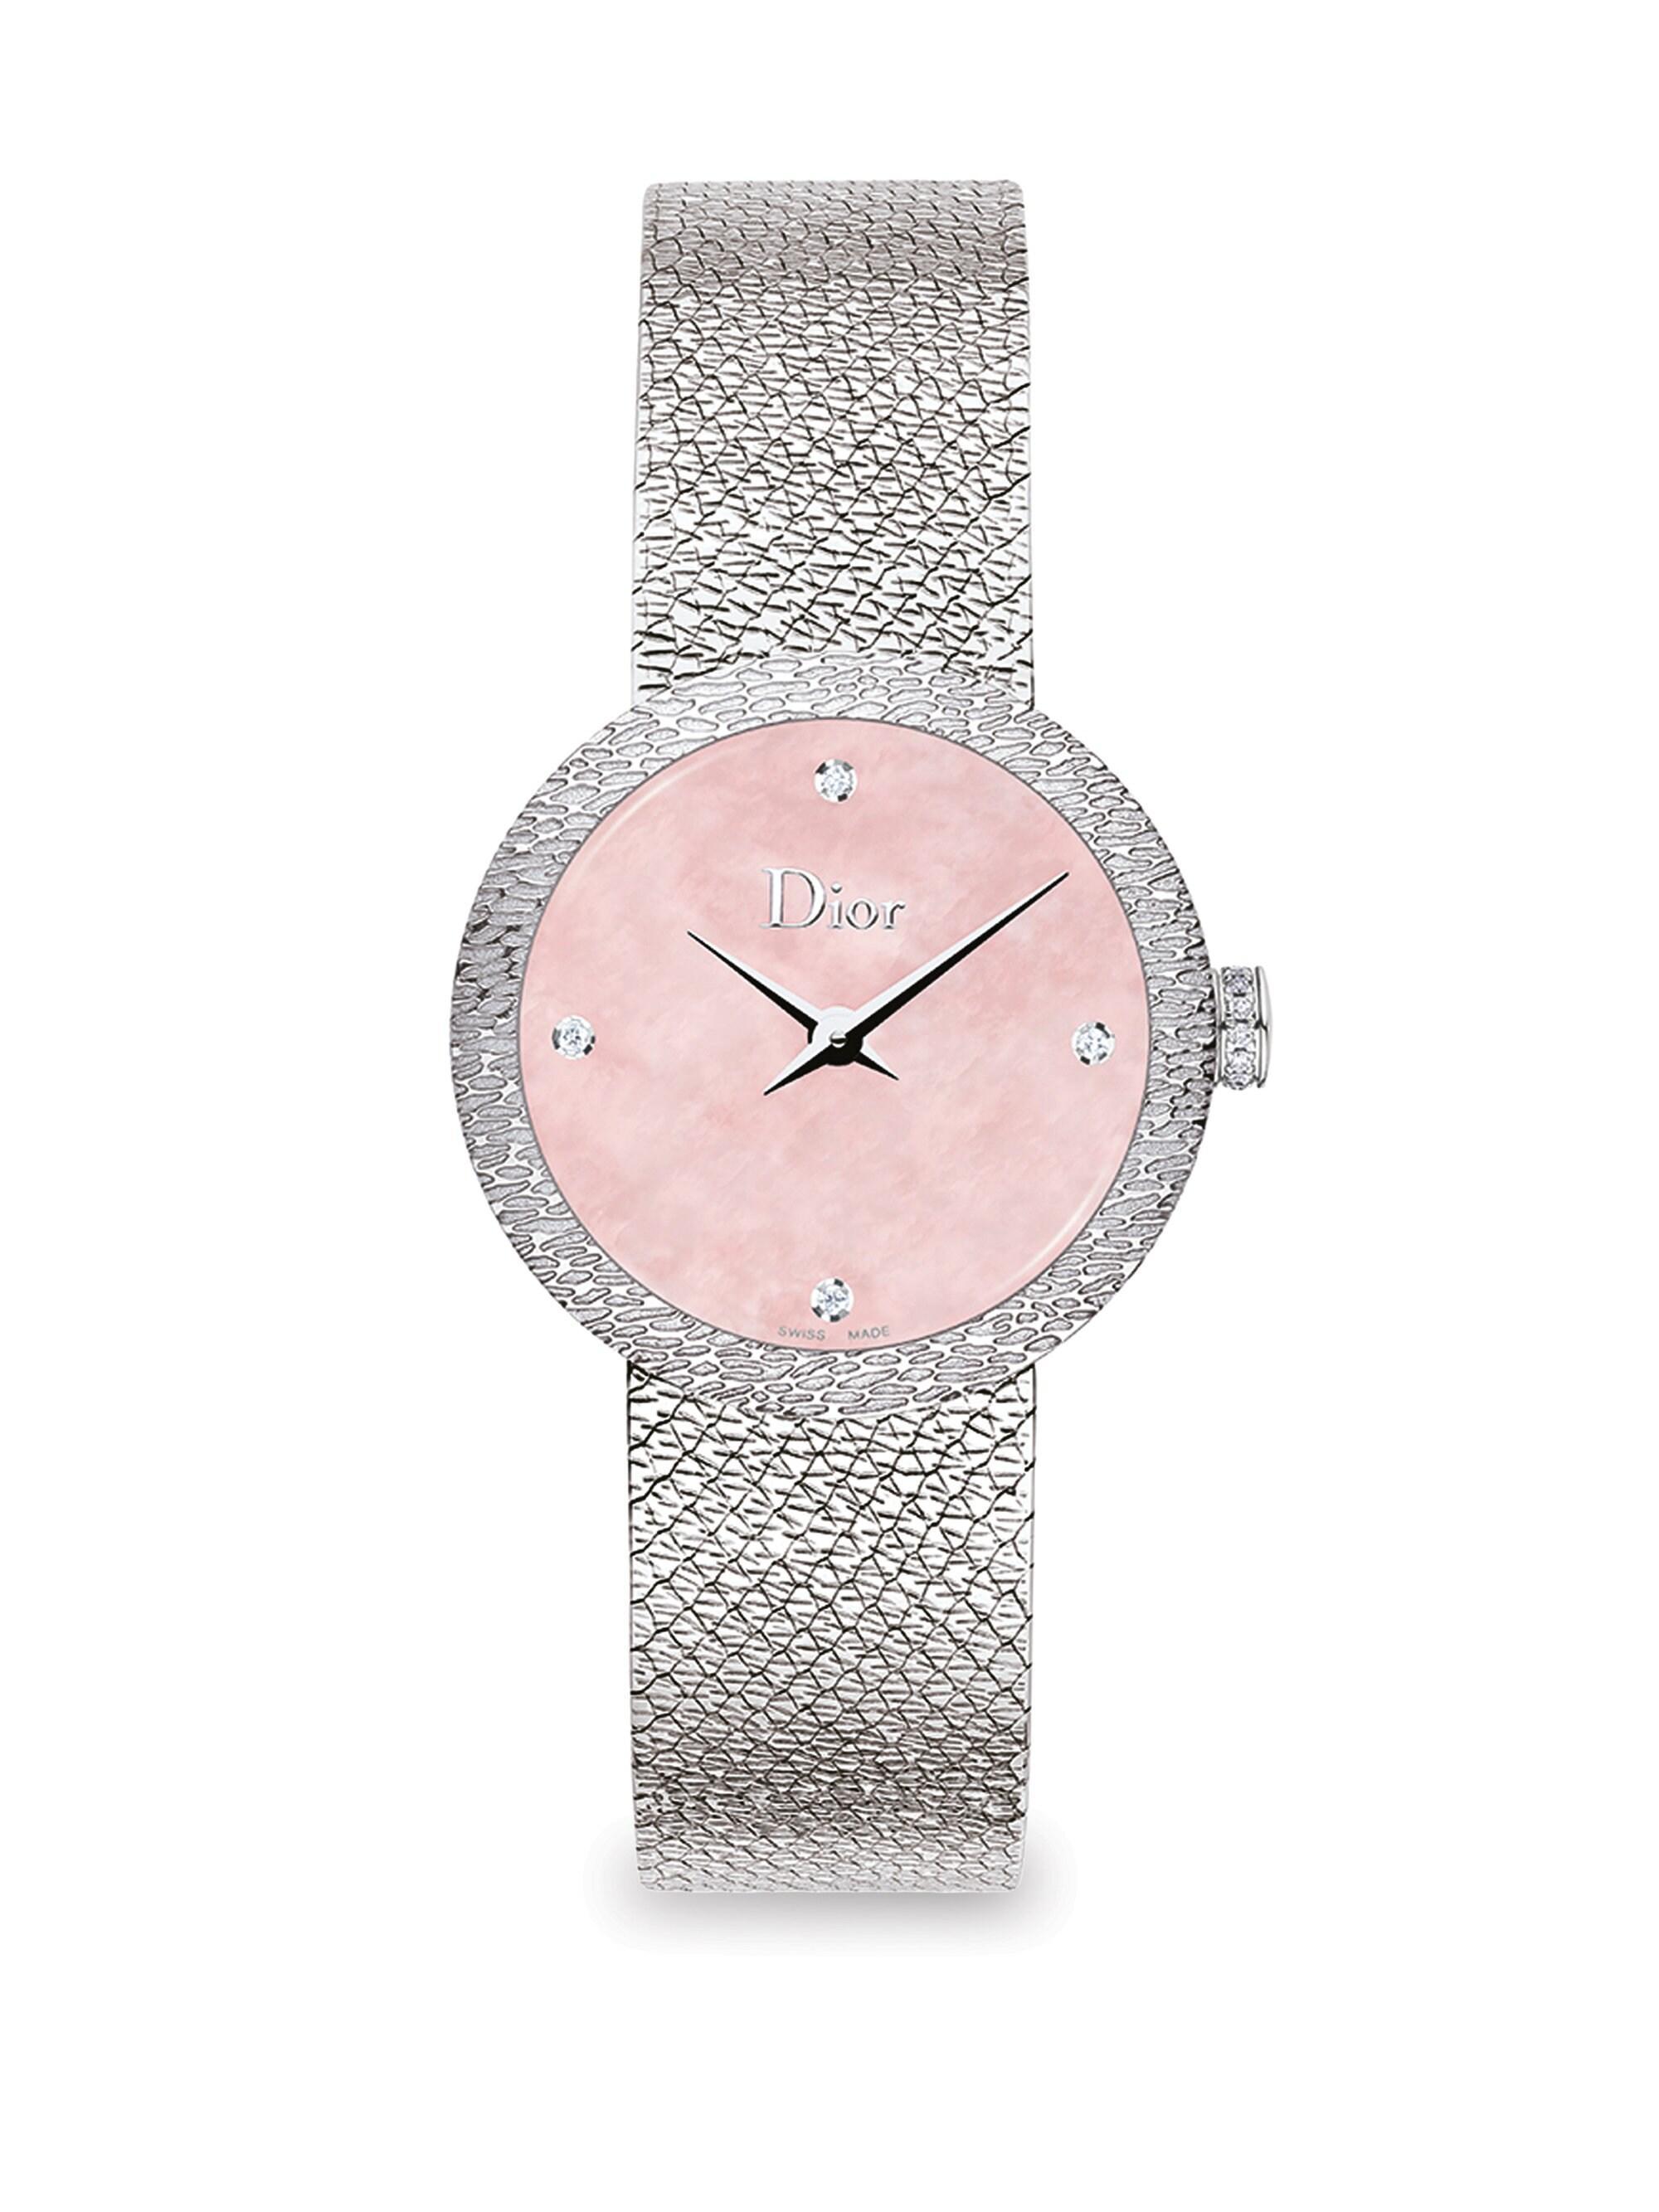 00e11f6ac Dior - Women's La D De 25mm Pink Satine Watch - Pink - Lyst. View fullscreen